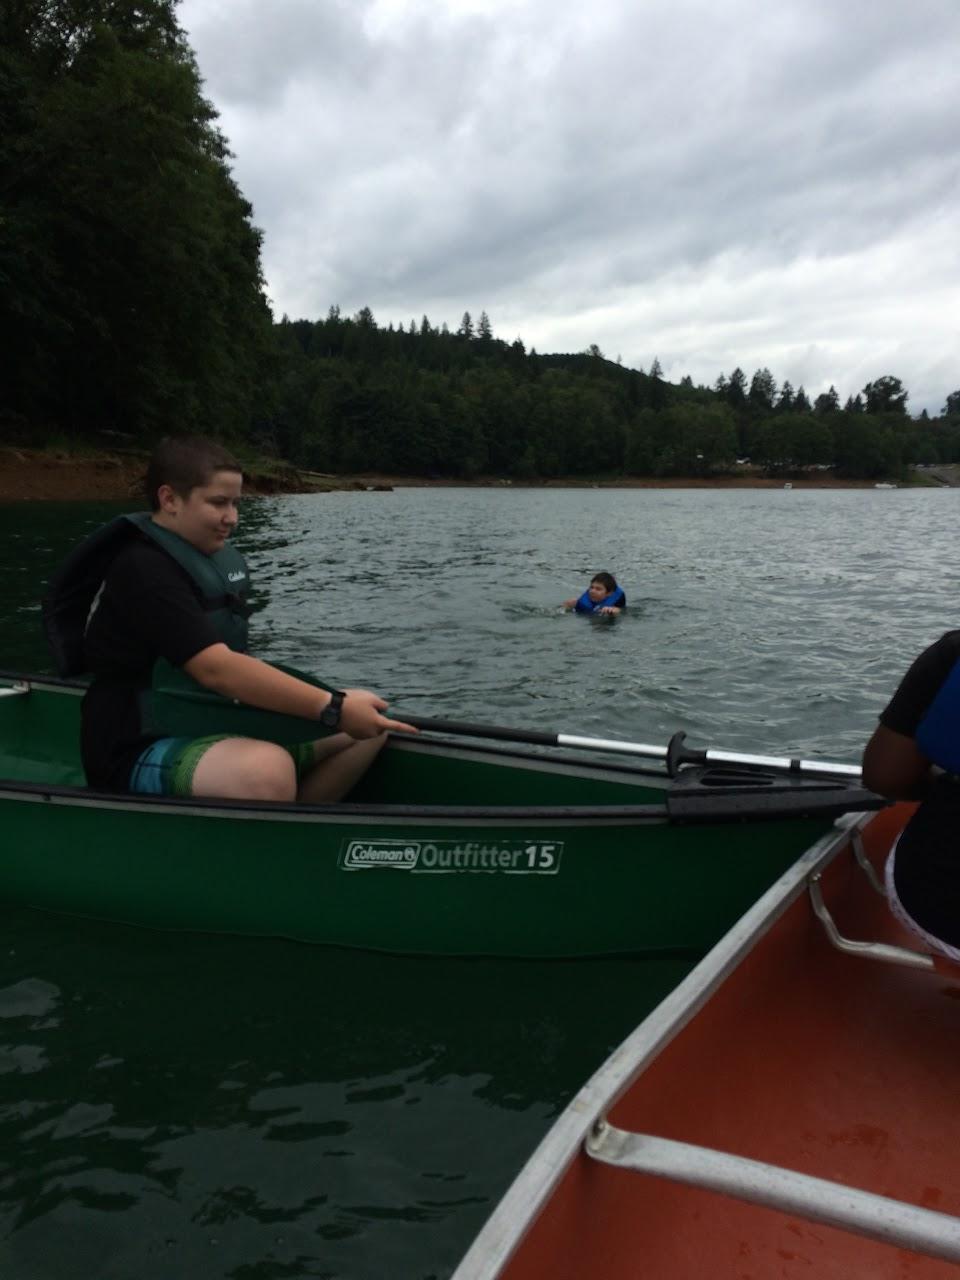 canoe weekend july 2015 - IMG_2959.JPG